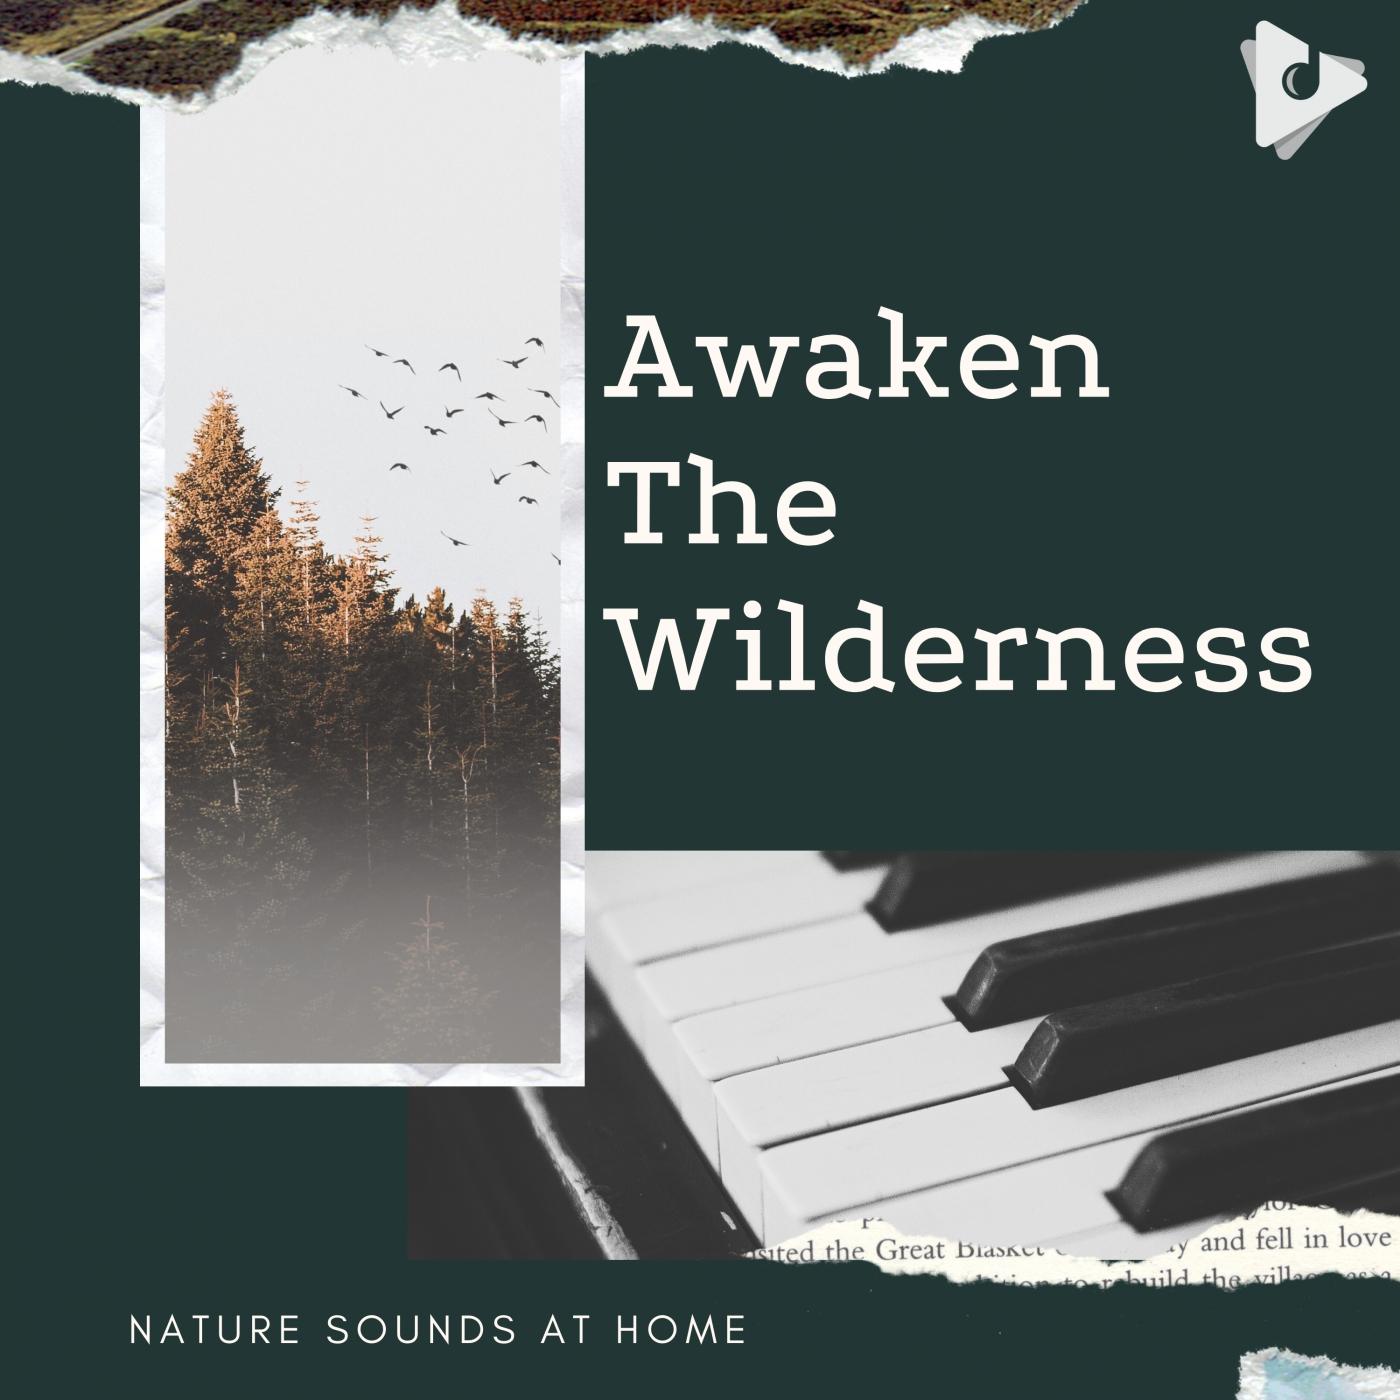 Awaken The Wilderness